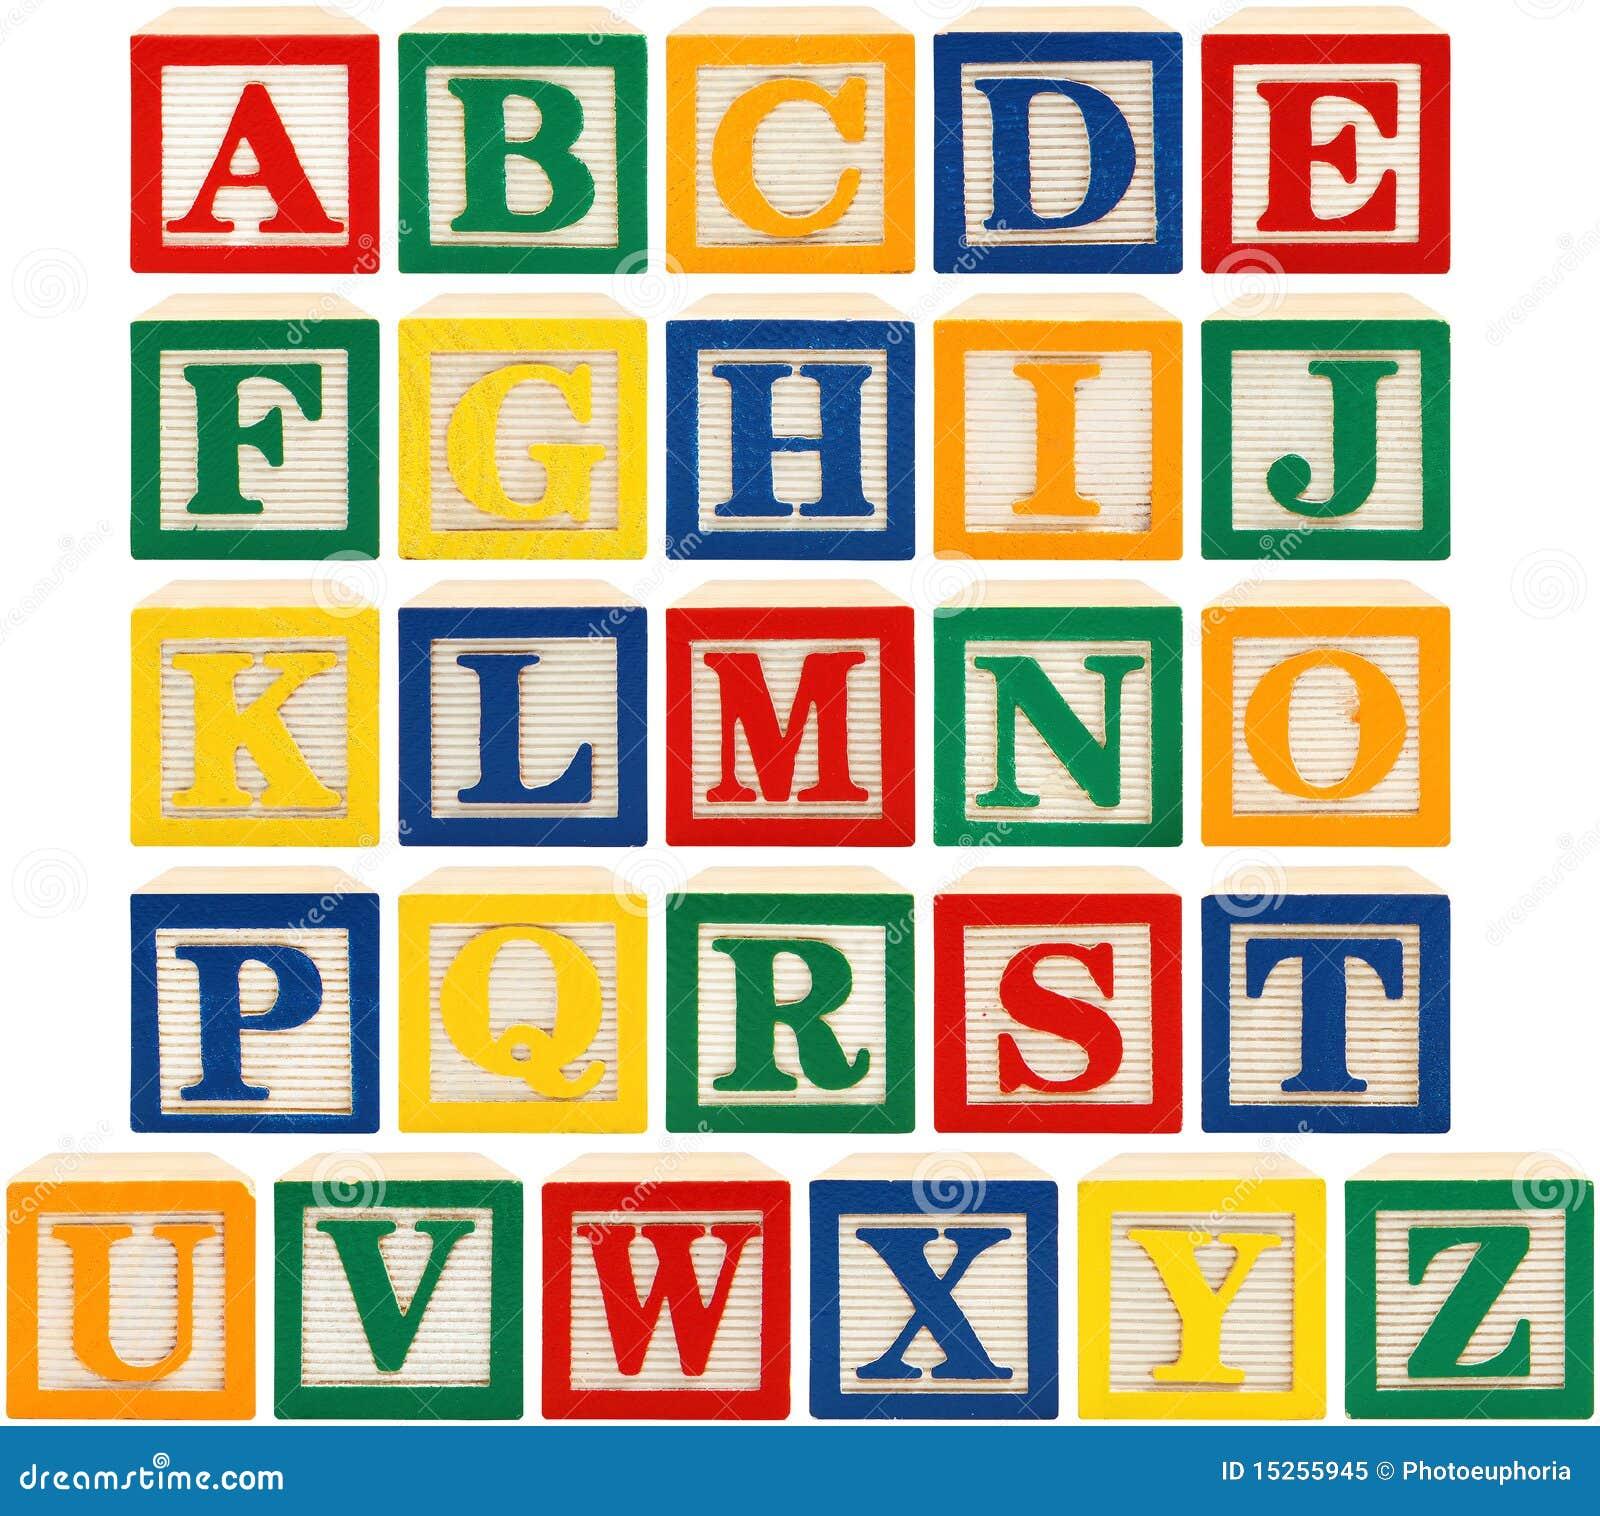 Alphabet Blocks Royalty Free Stock Photo - Image: 15255945